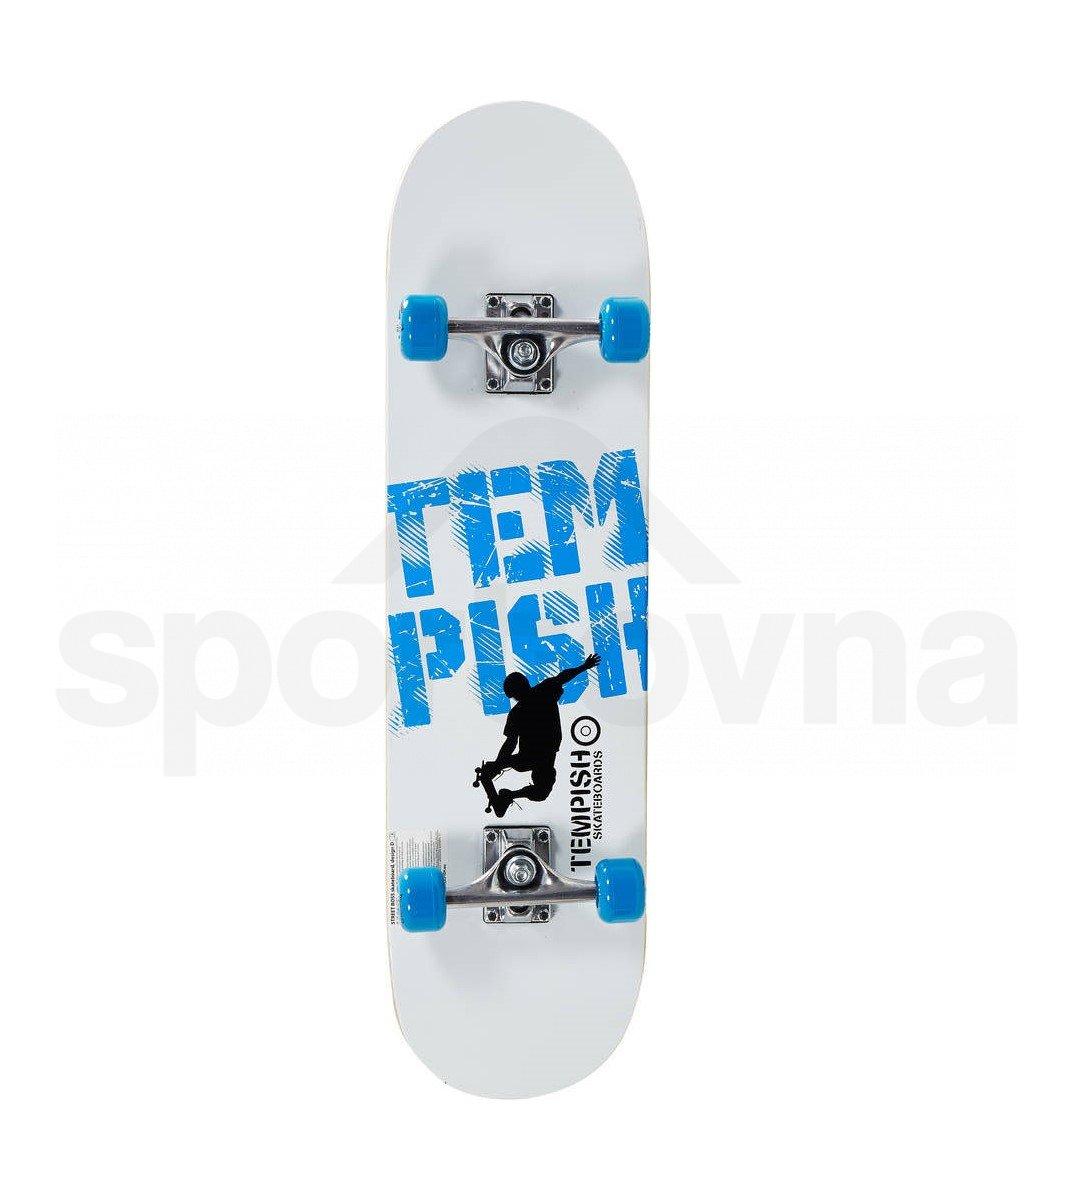 tempish-street-boss-complete-skateboard-c8